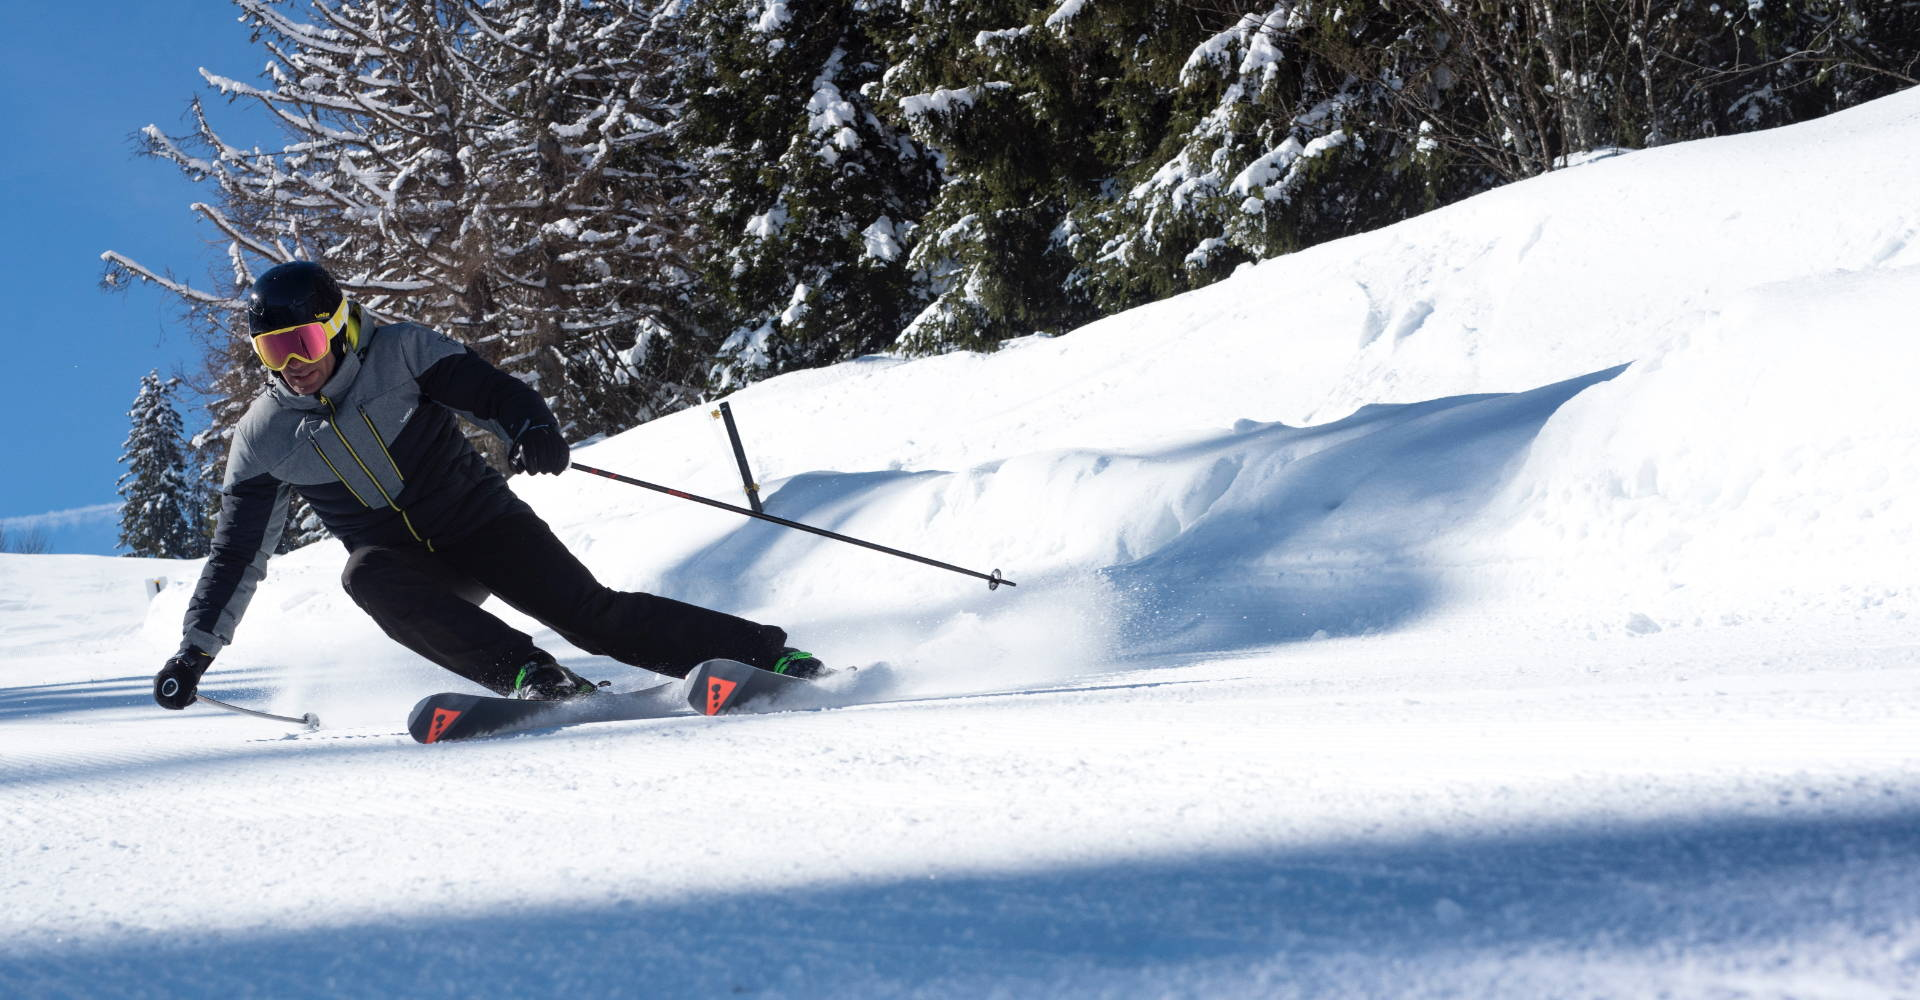 WEDZE (ウェッゼ) スキー ダウンジャケット ウォーム Downhill 900 メンズ